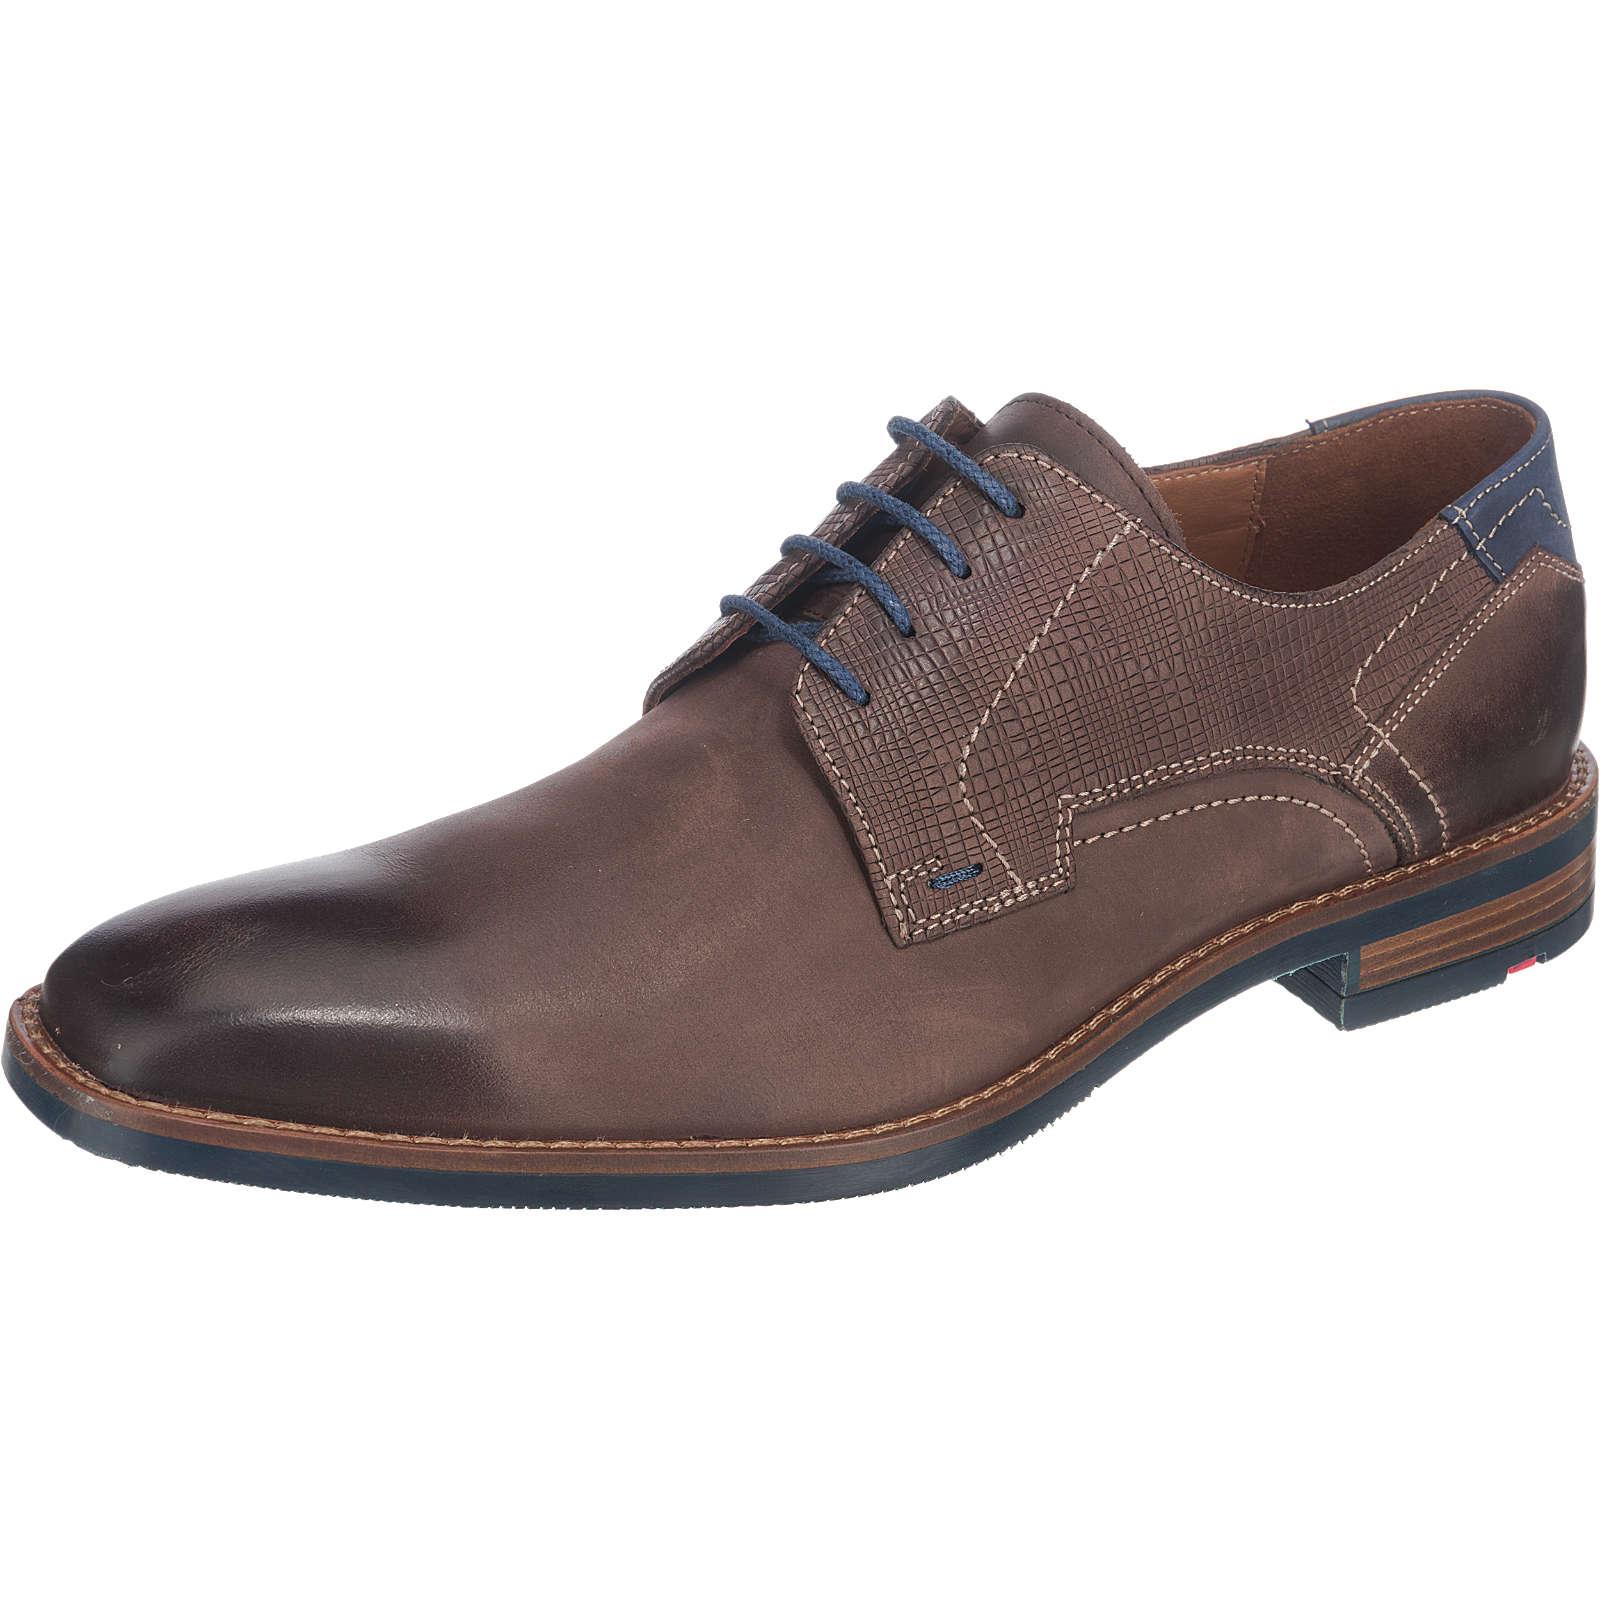 LLOYD Ike Business Schuhe braun Herren Gr. 44,5